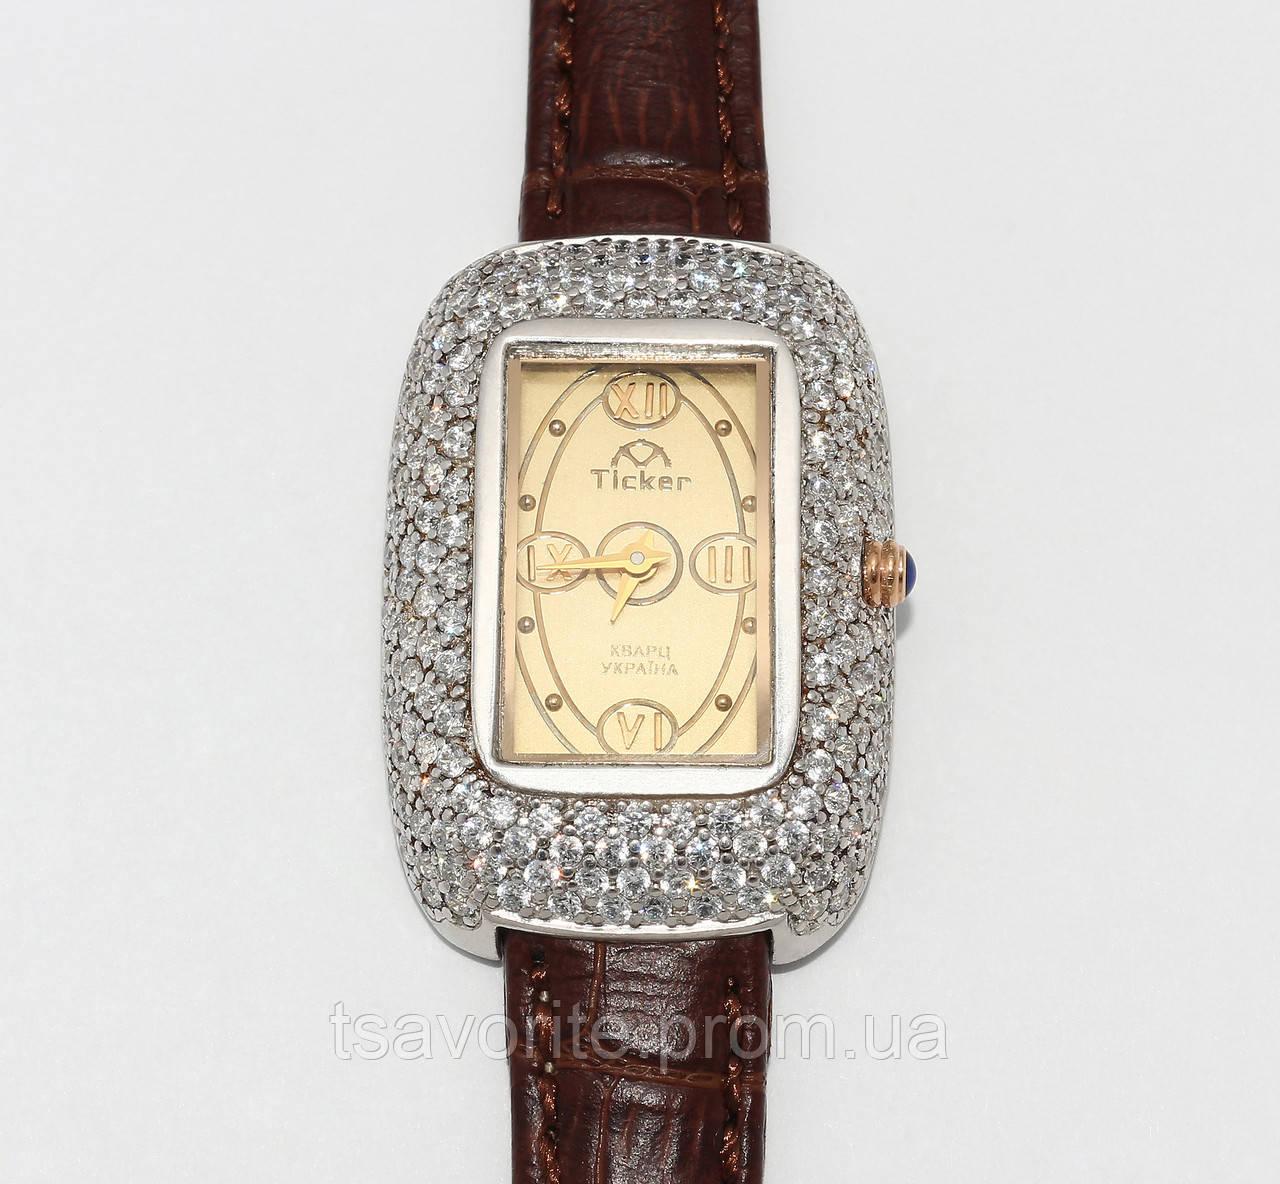 Женские серебряные часы ЖЧХ-2